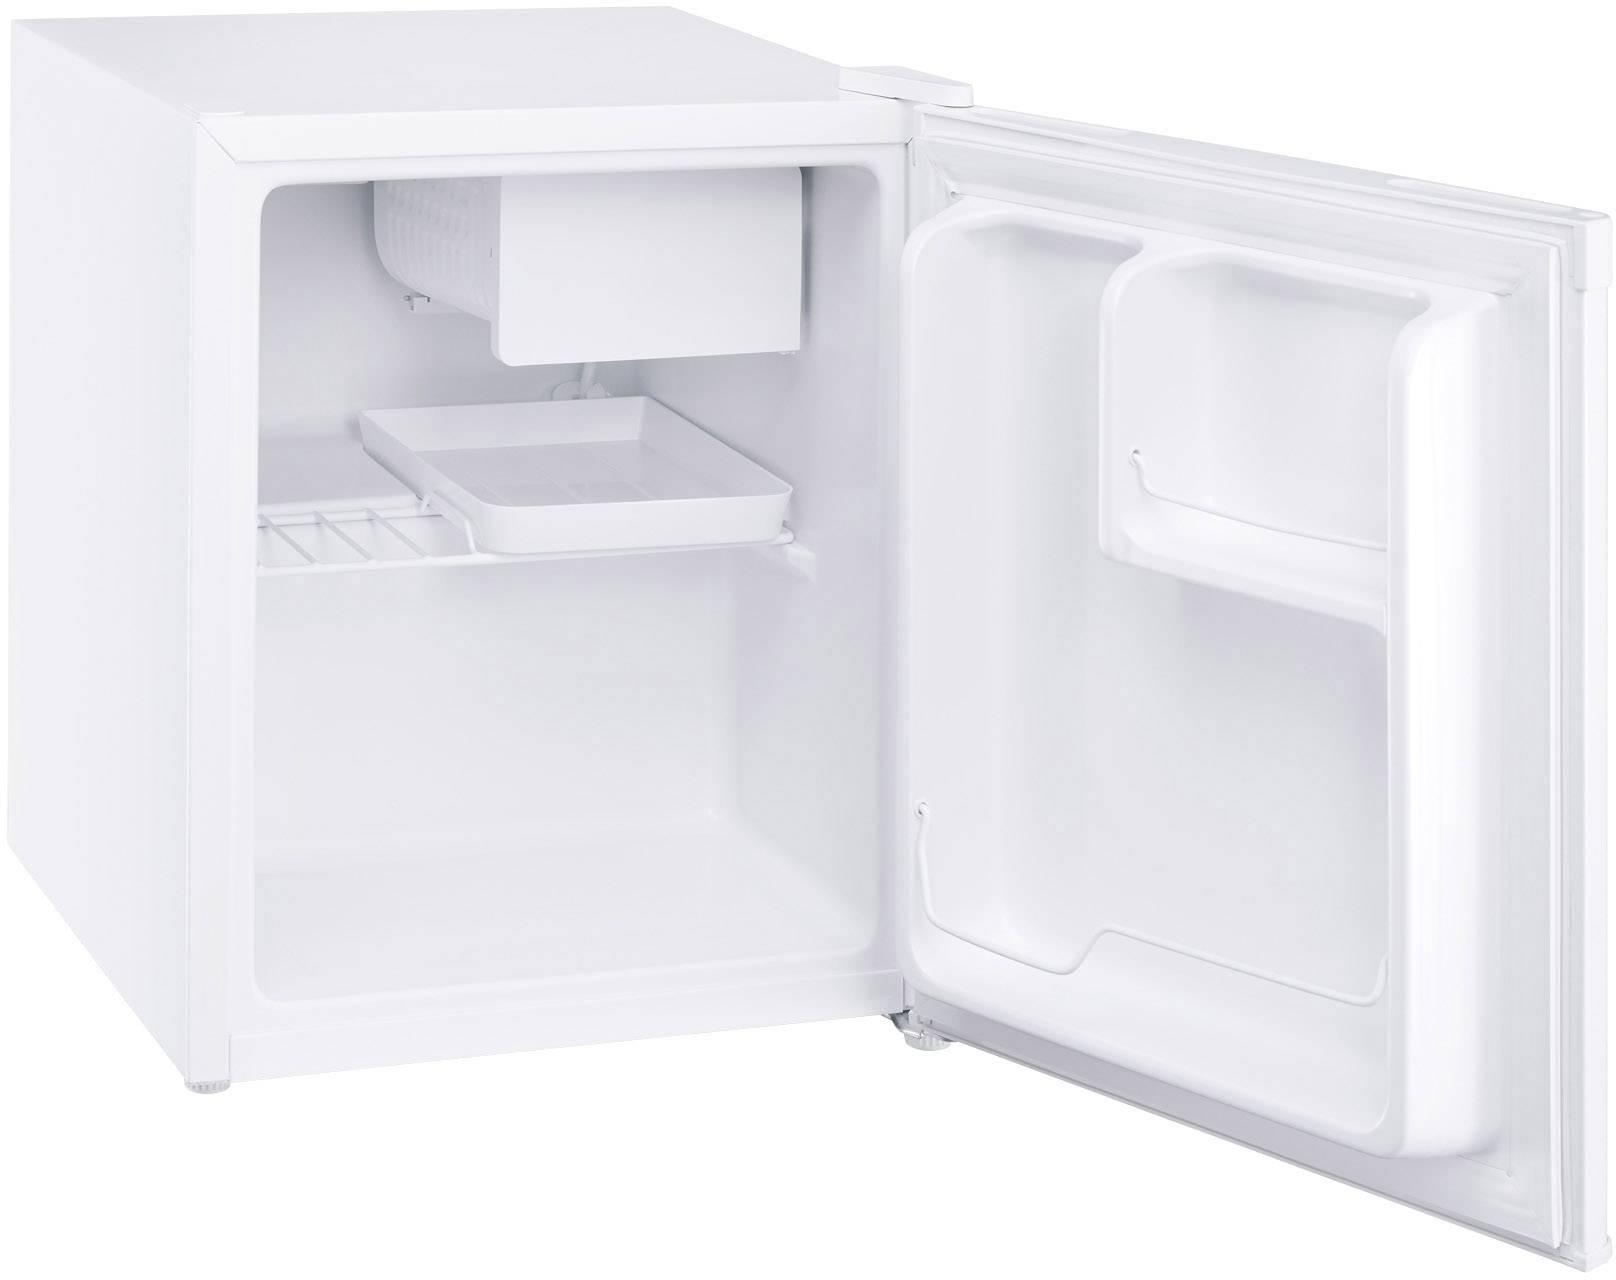 Kleiner Kühlschrank Conrad : Severin ks kühlschrank eek a a d l standgerät